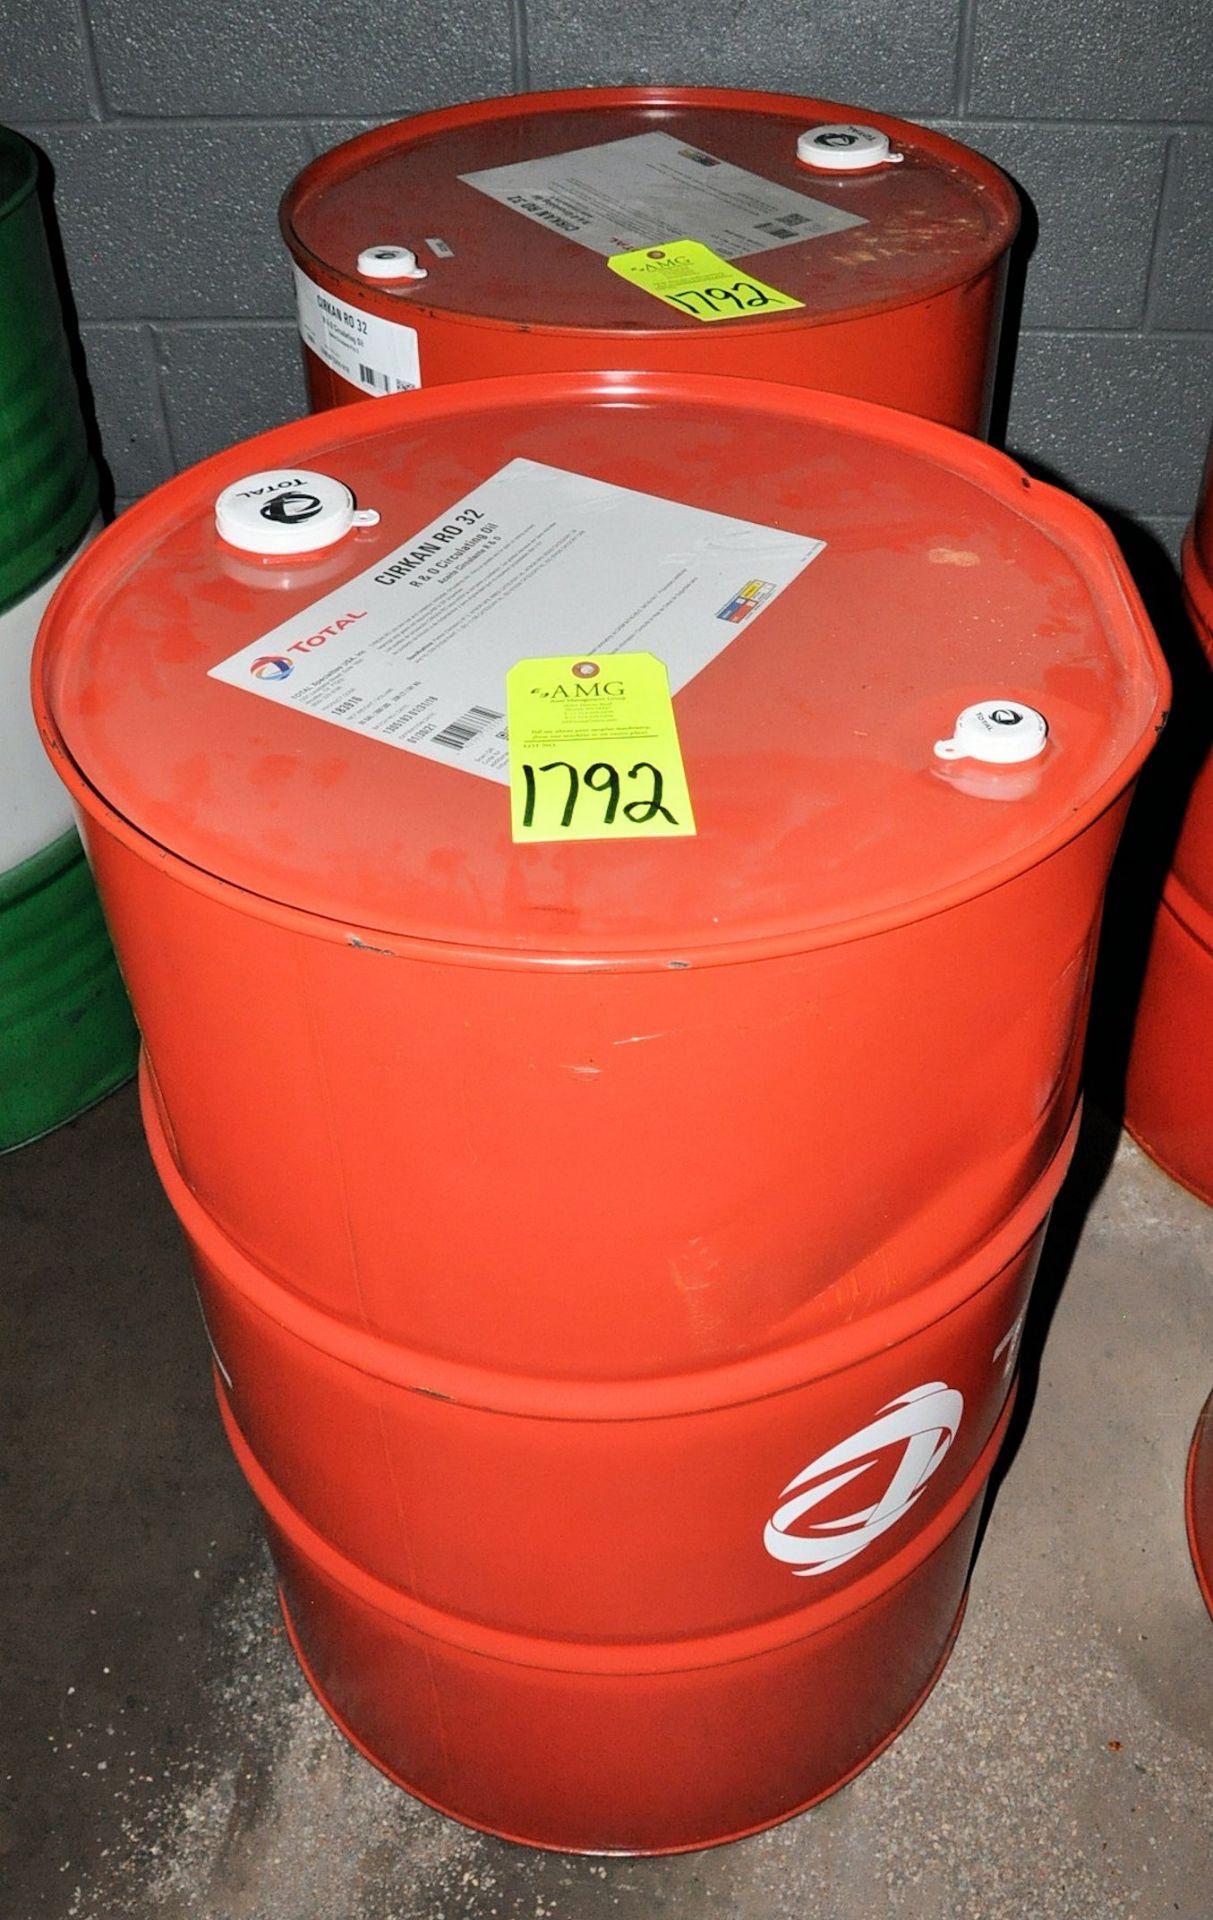 Lot-(2) 55-Gallon Drums of Total Cirkan RO 32 R & O Circulating Oil, (Oils Storage Building), ( - Image 2 of 2